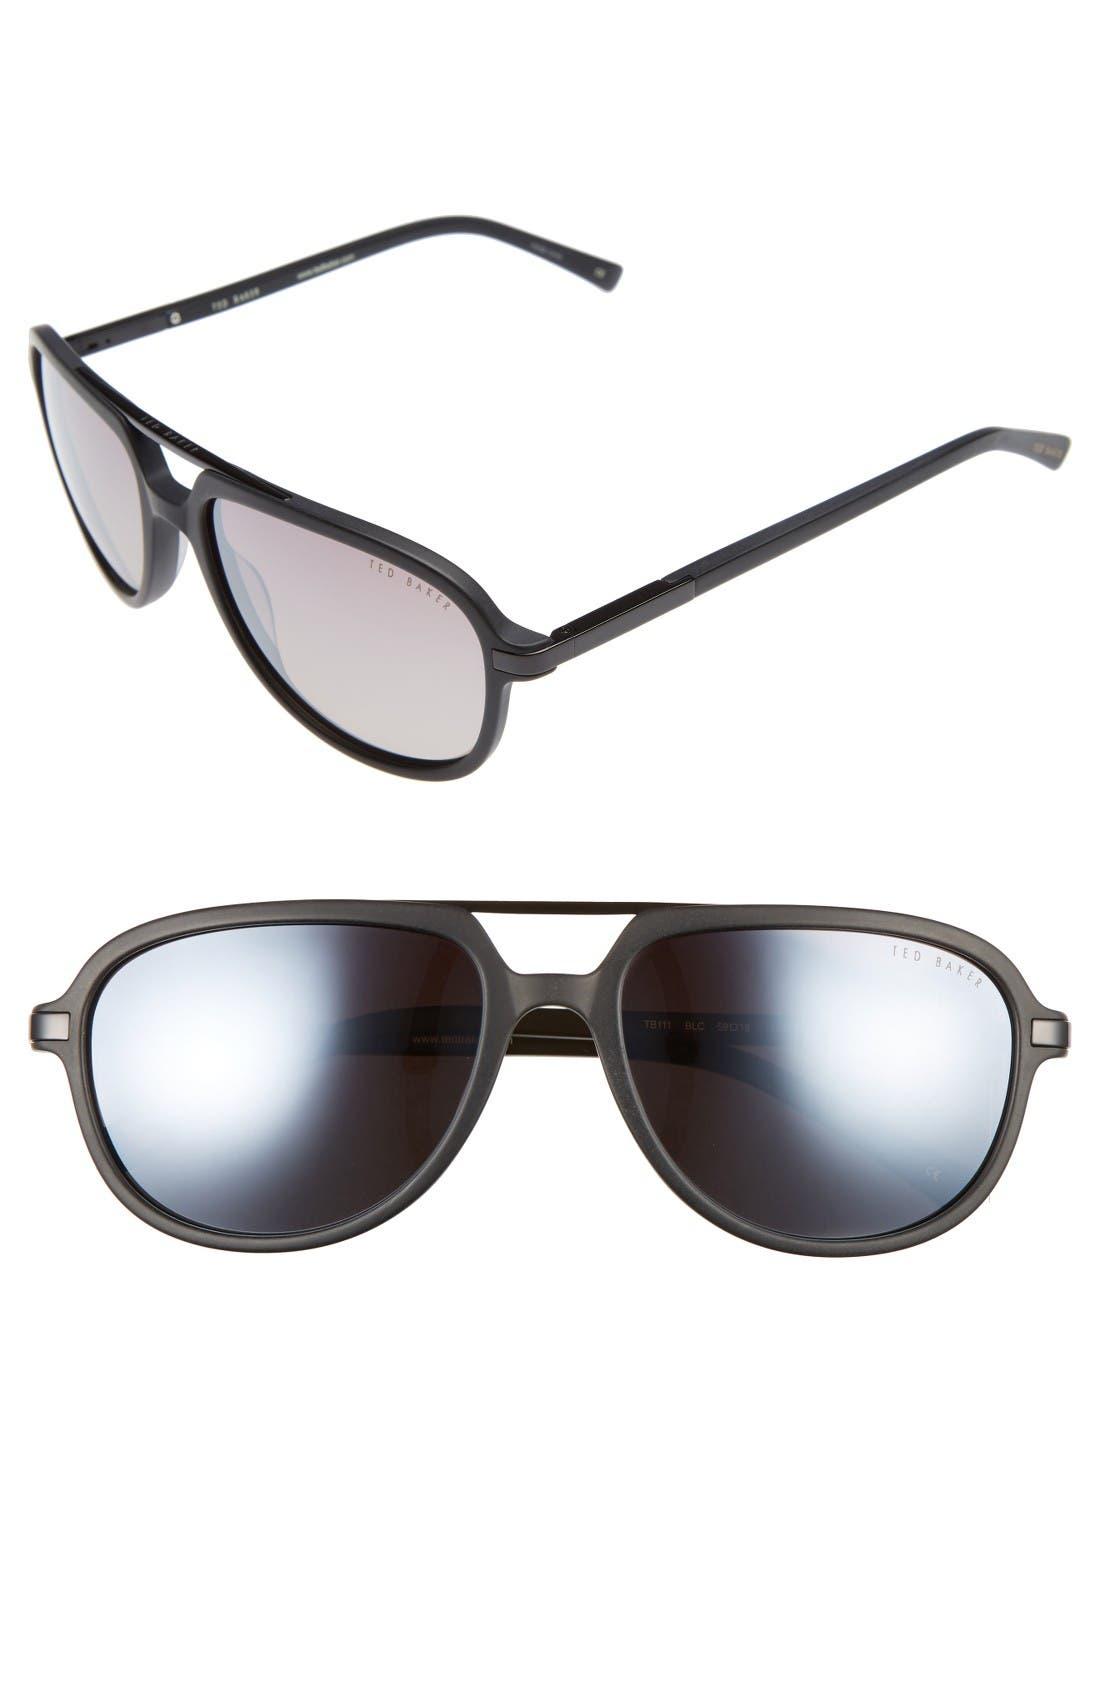 59mm Polarized Aviator Sunglasses,                             Main thumbnail 1, color,                             Black